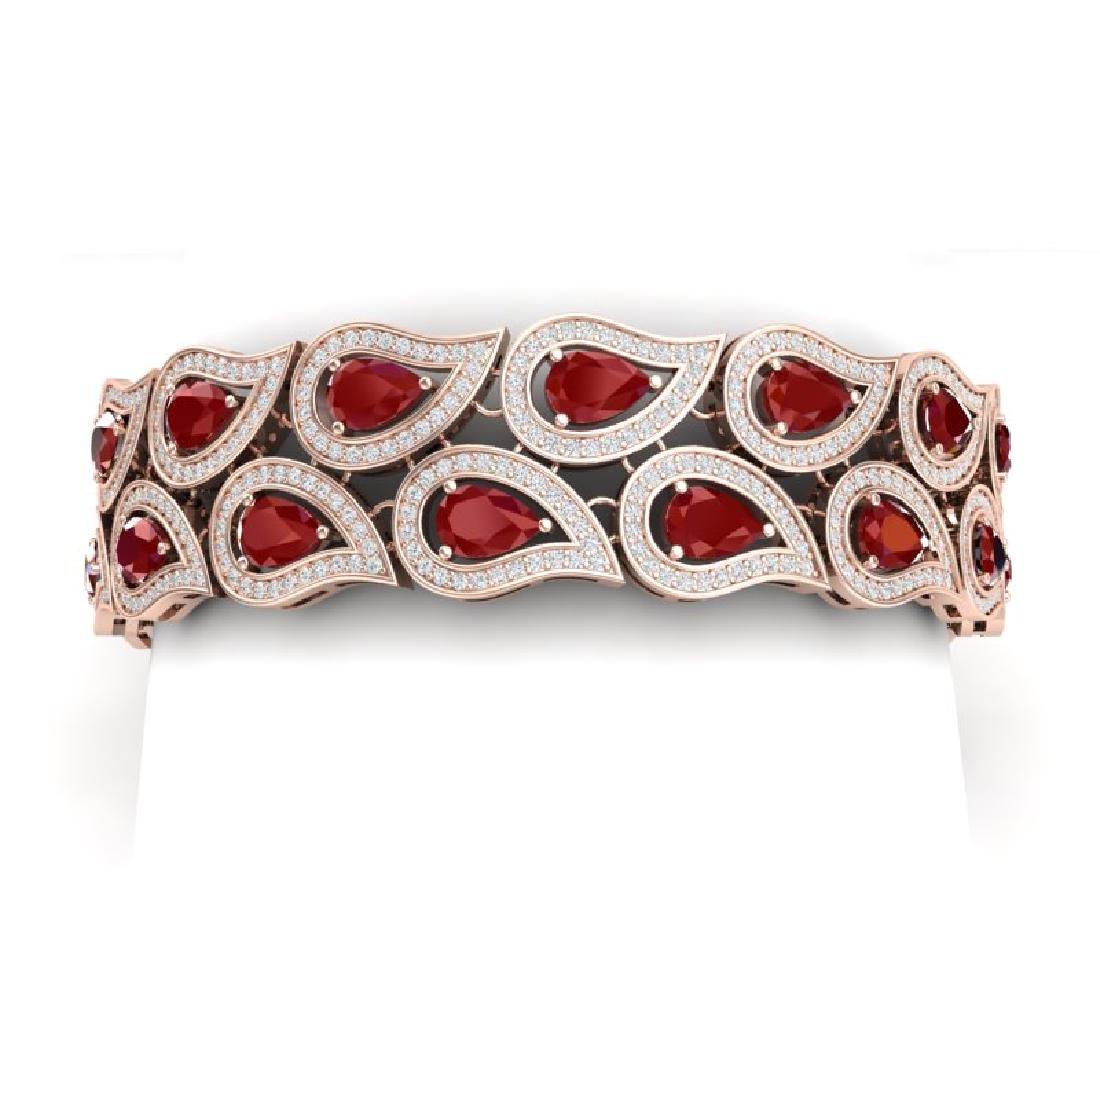 20.1 CTW Royalty Designer Ruby & VS Diamond Bracelet